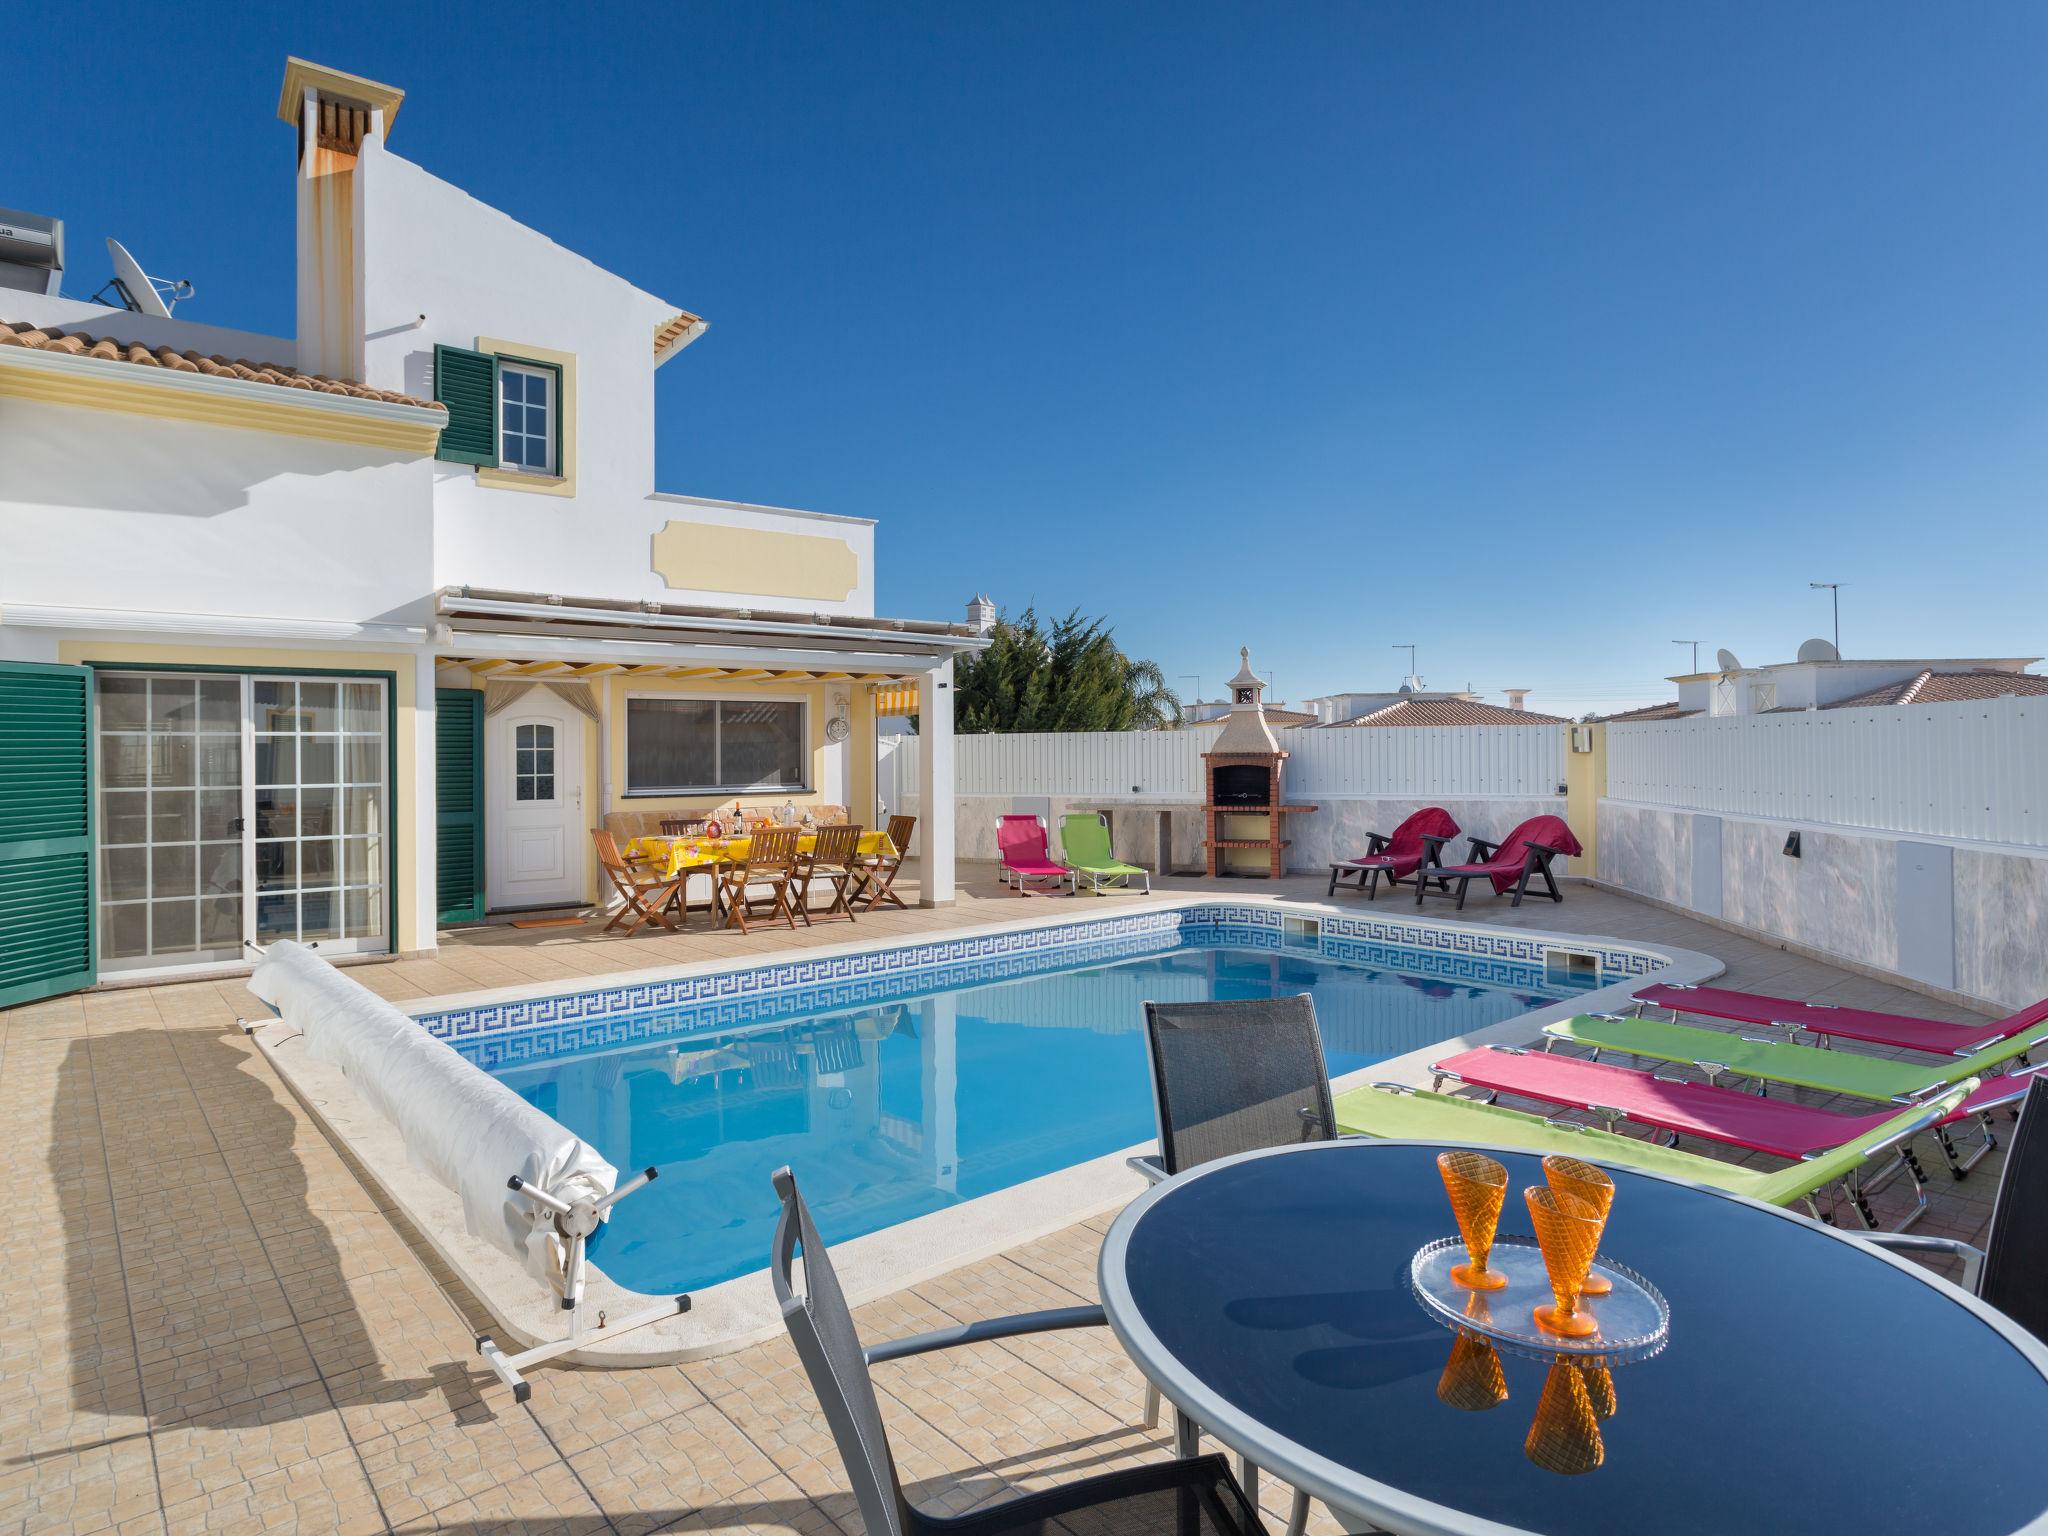 Accommodation in Portugal Villas Fullstop.: Book Cheap Holiday Villa For Rent In Algarve